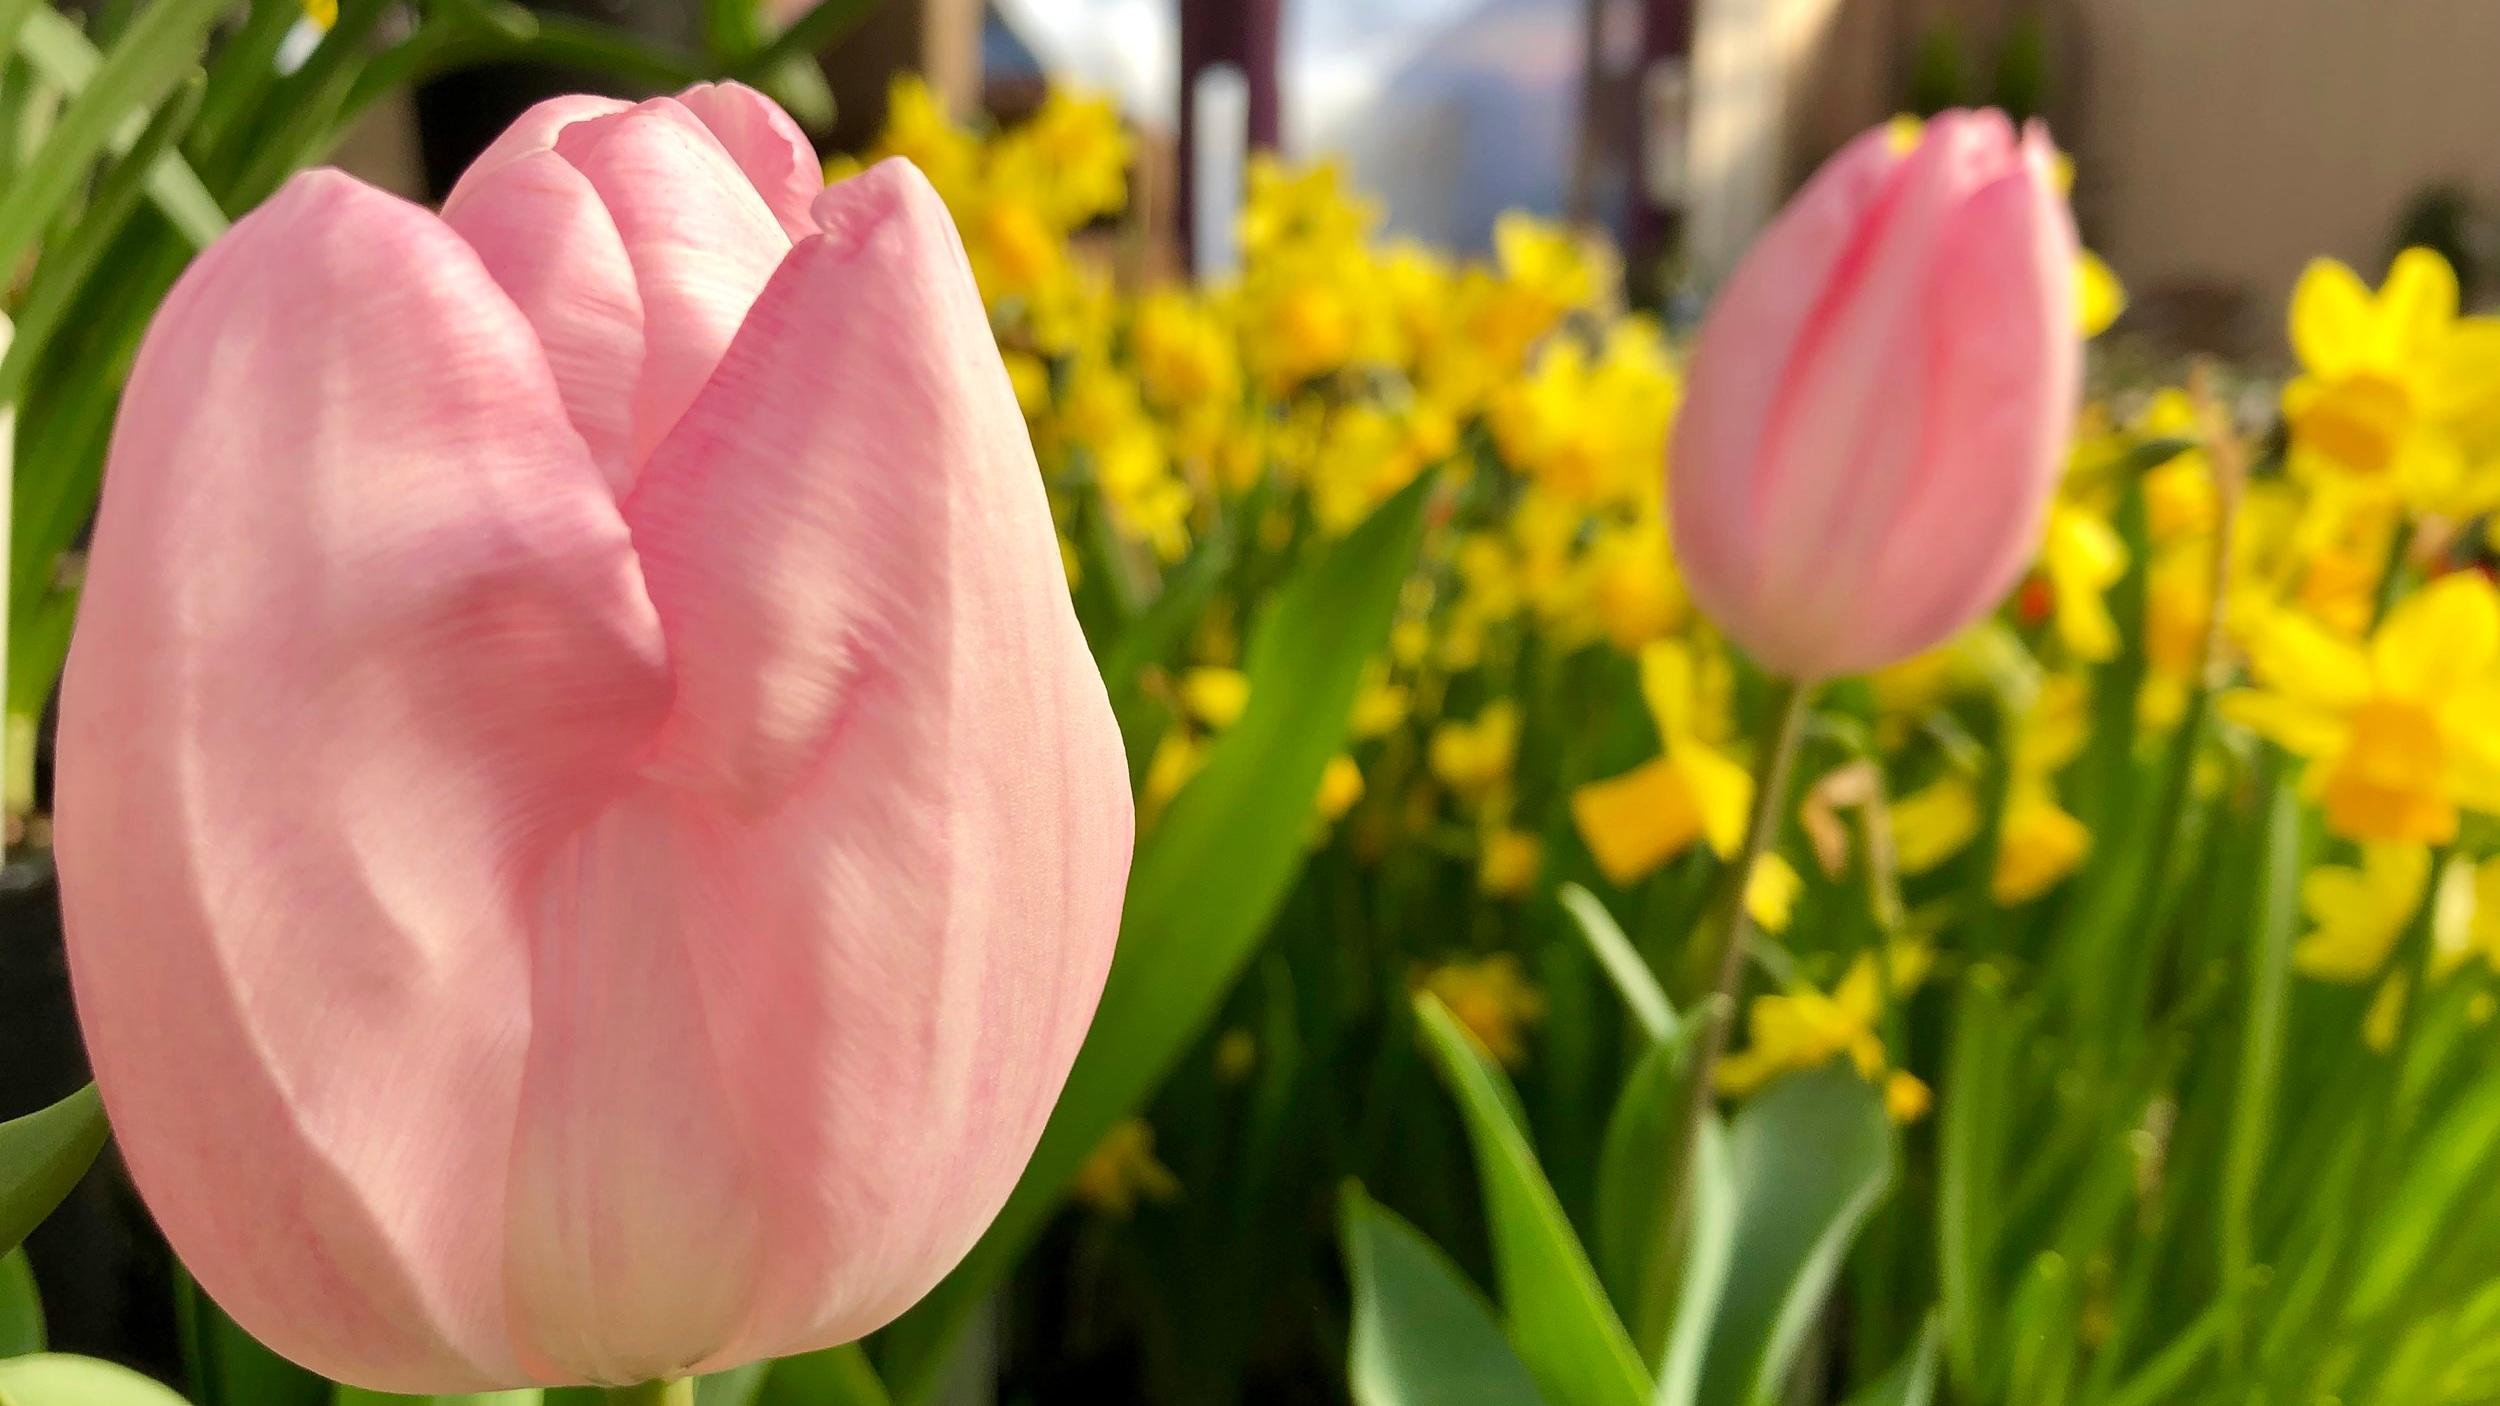 tulips+%26+daffodils.jpg